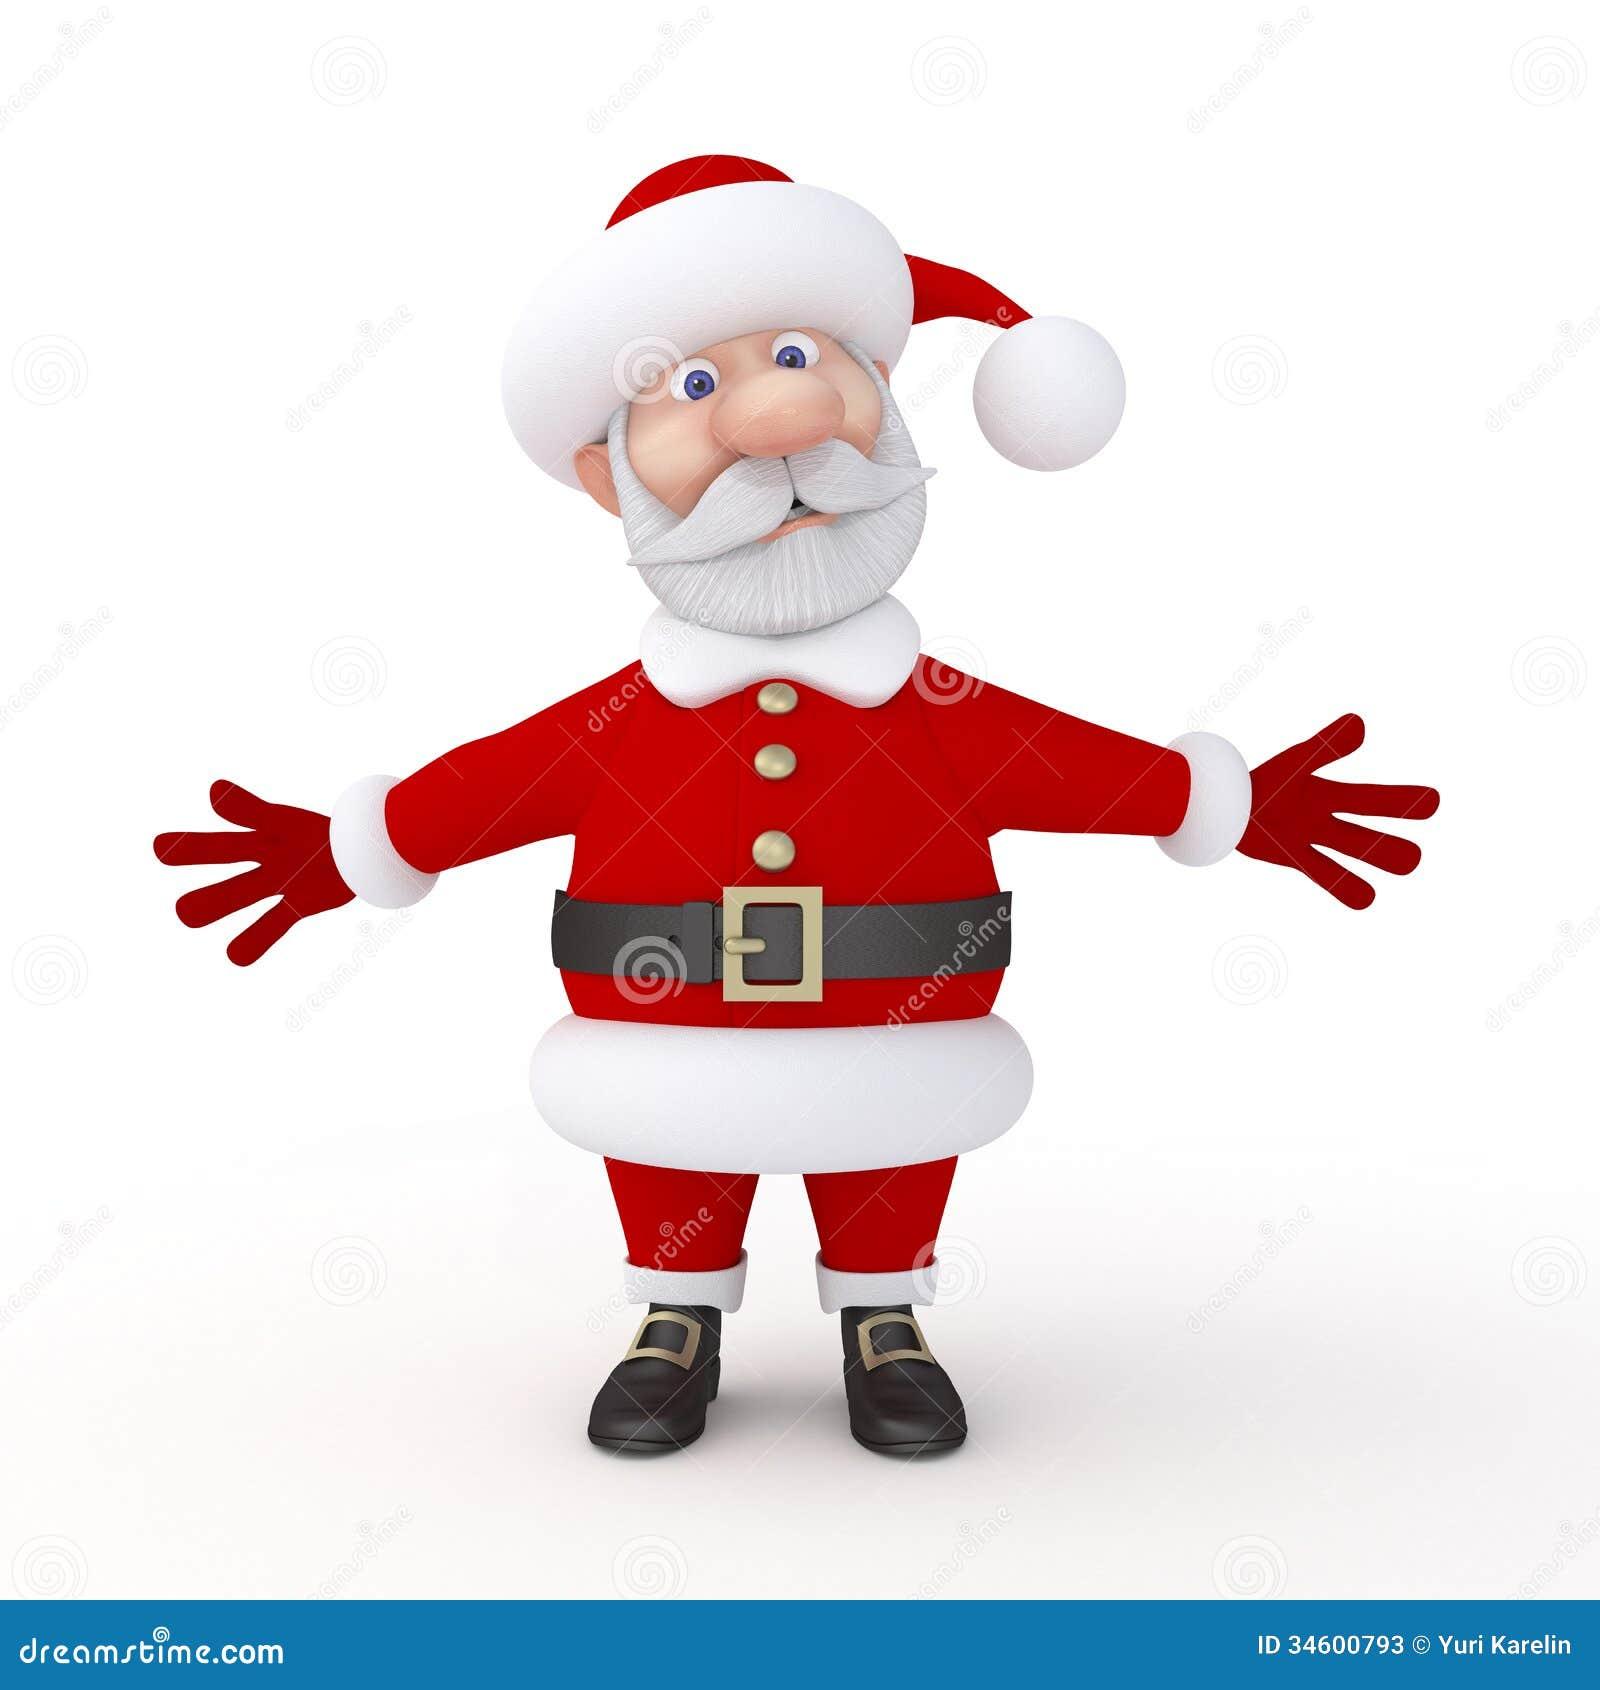 download christmas holiday stock illustration illustration of comic 34600793